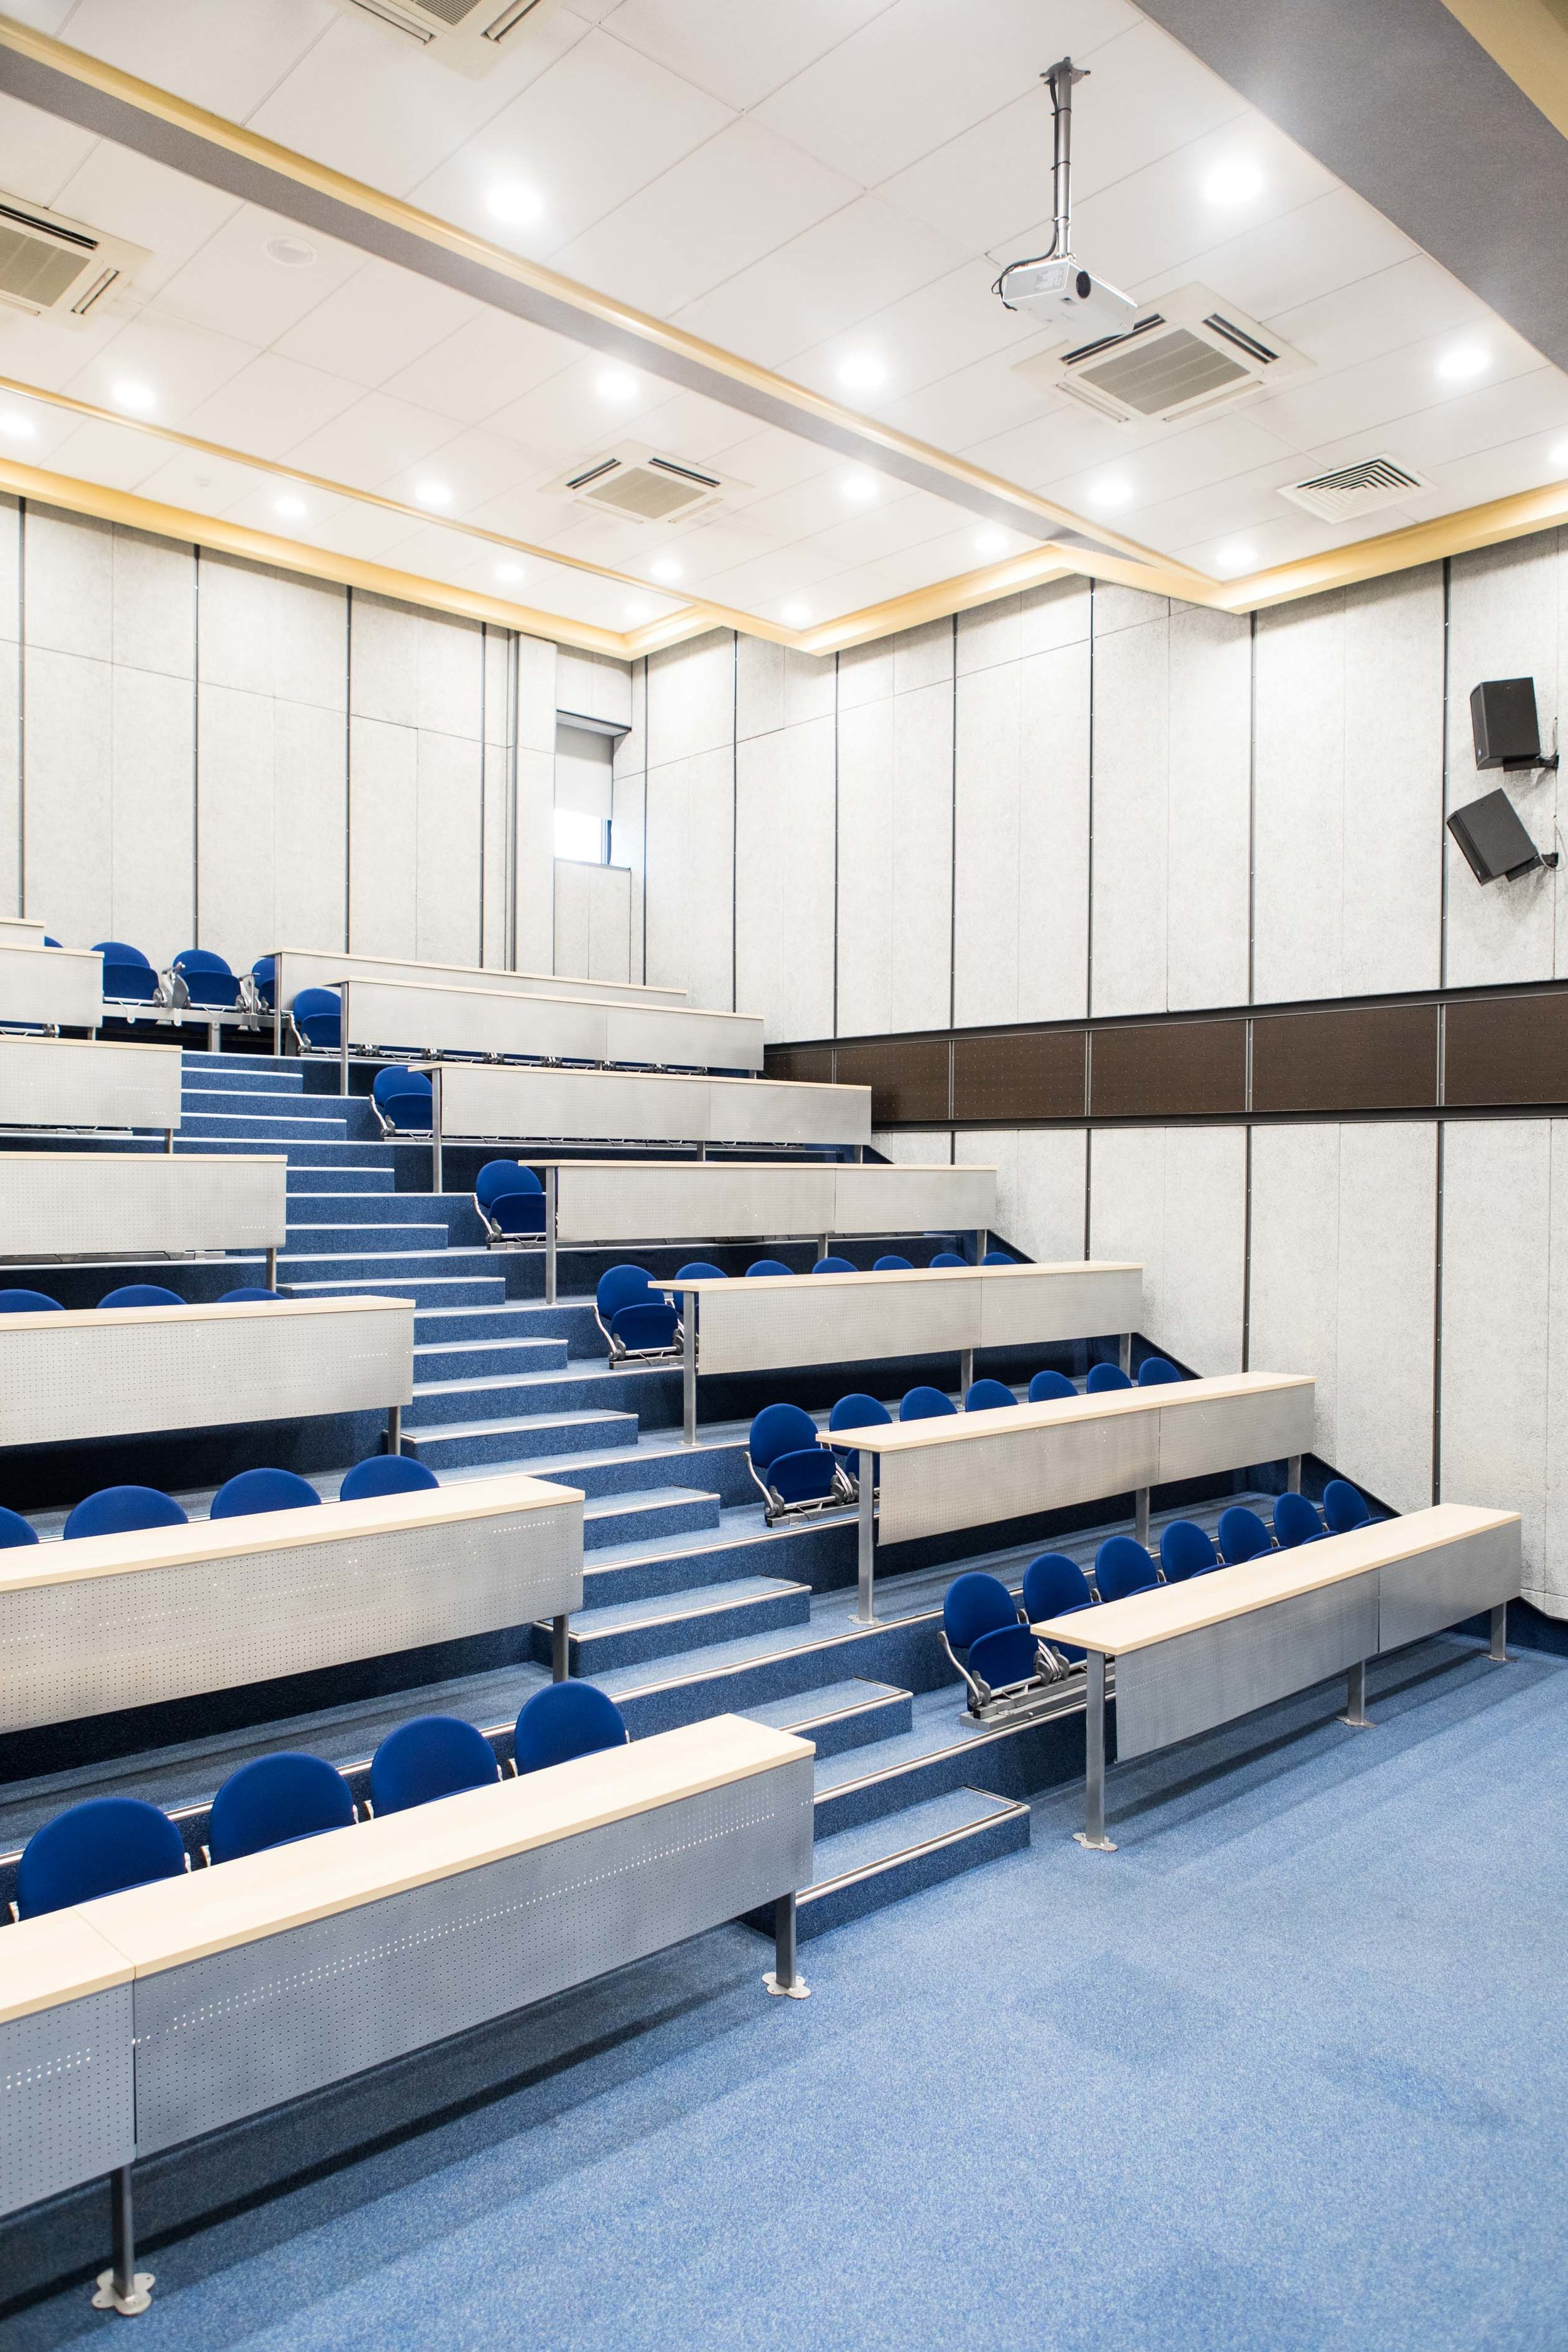 EuropeanUniversity©AndreasPoupoutsis-39-min.jpg